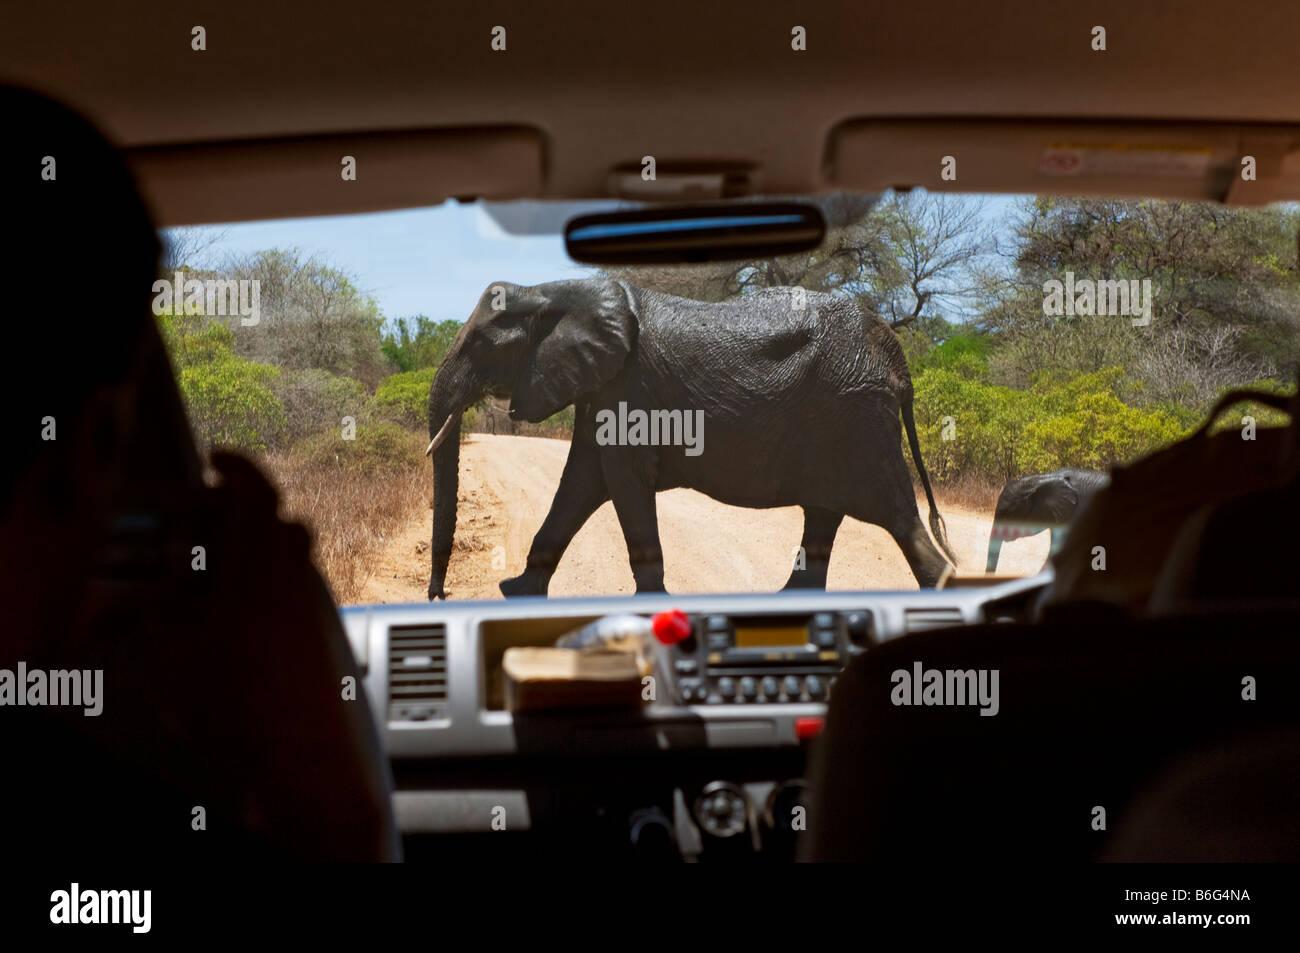 Elefant überqueren Pirschfahrt SAFARI im Krüger KRÜGER NP Nationalpark Auto Fahrzeug Jeep Bus Kleinbus Stockbild